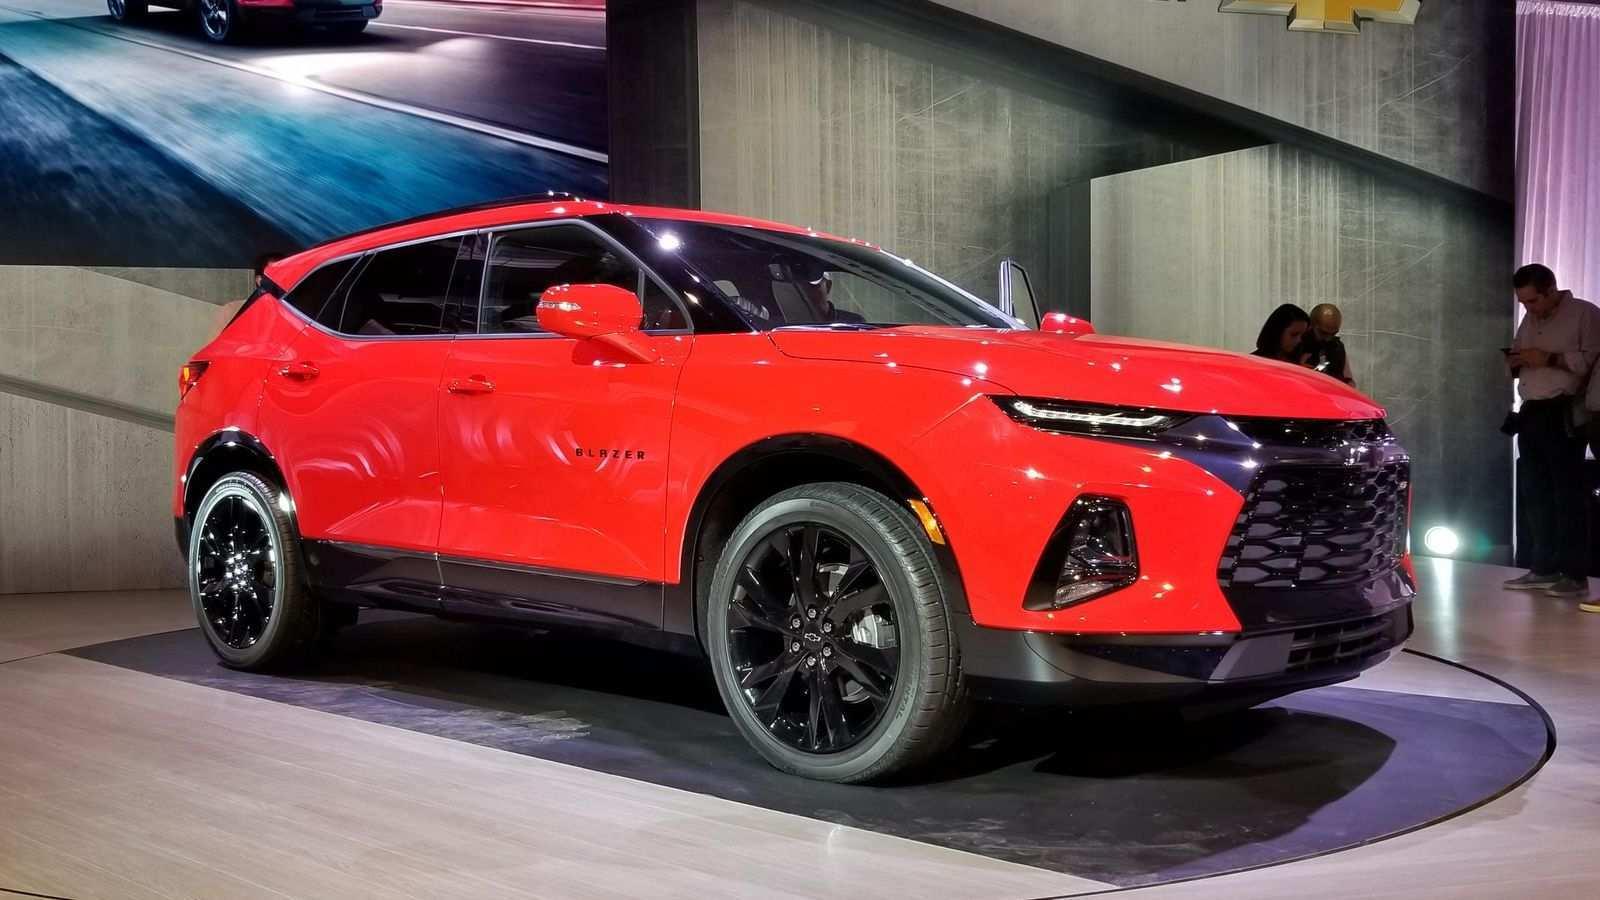 76 Best Review New New Chevrolet 2019 Blazer Engine Spy Shoot by New New Chevrolet 2019 Blazer Engine